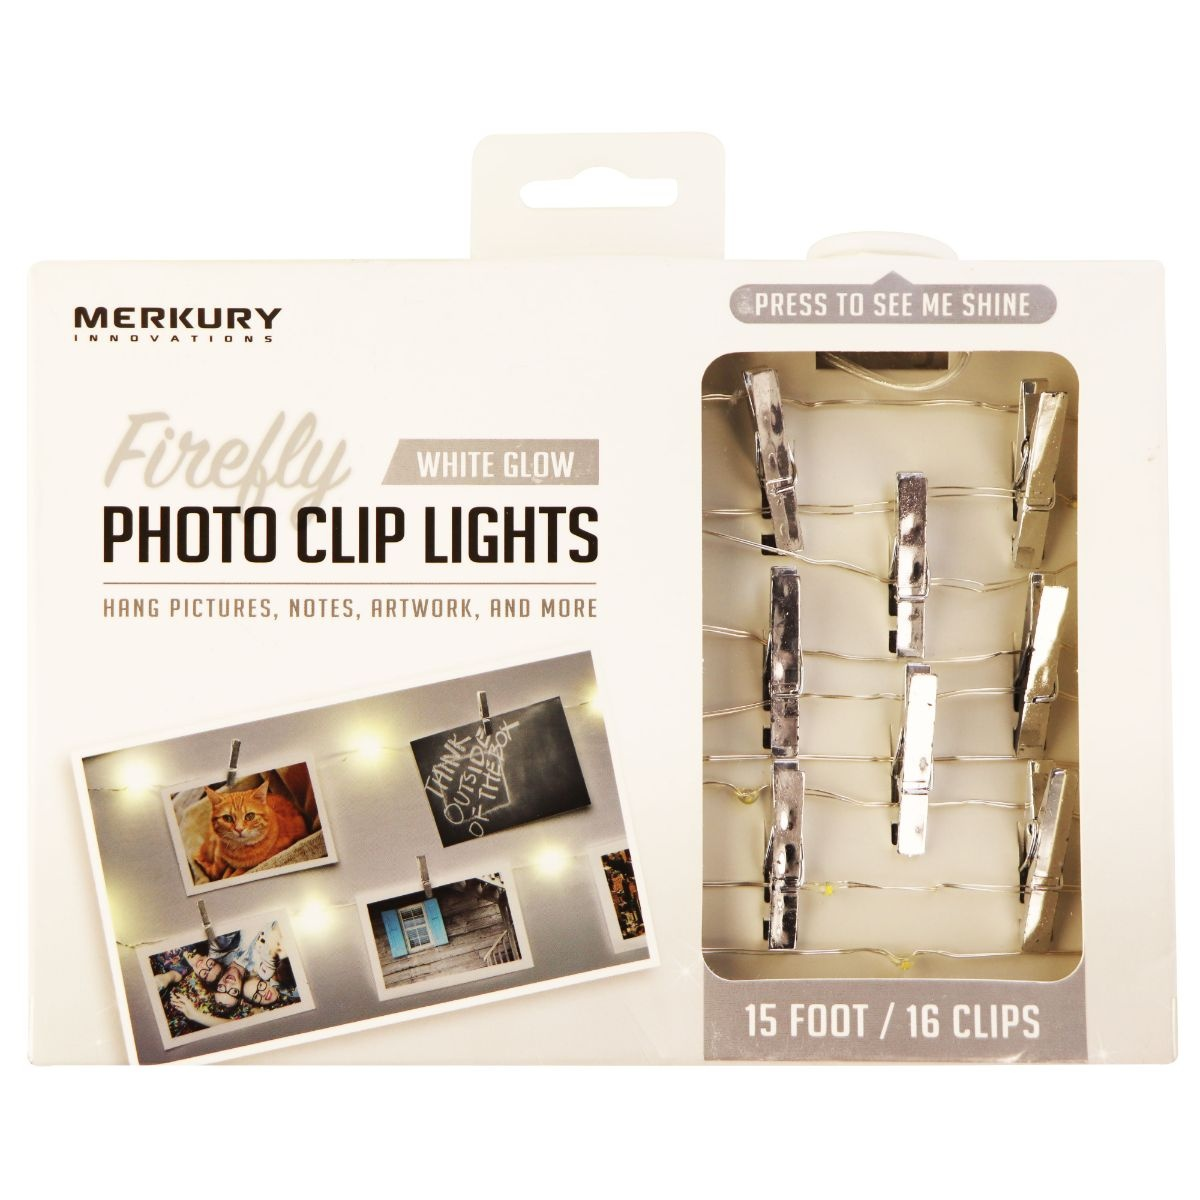 Merkury Innovations Firefly Photo Clip Lights